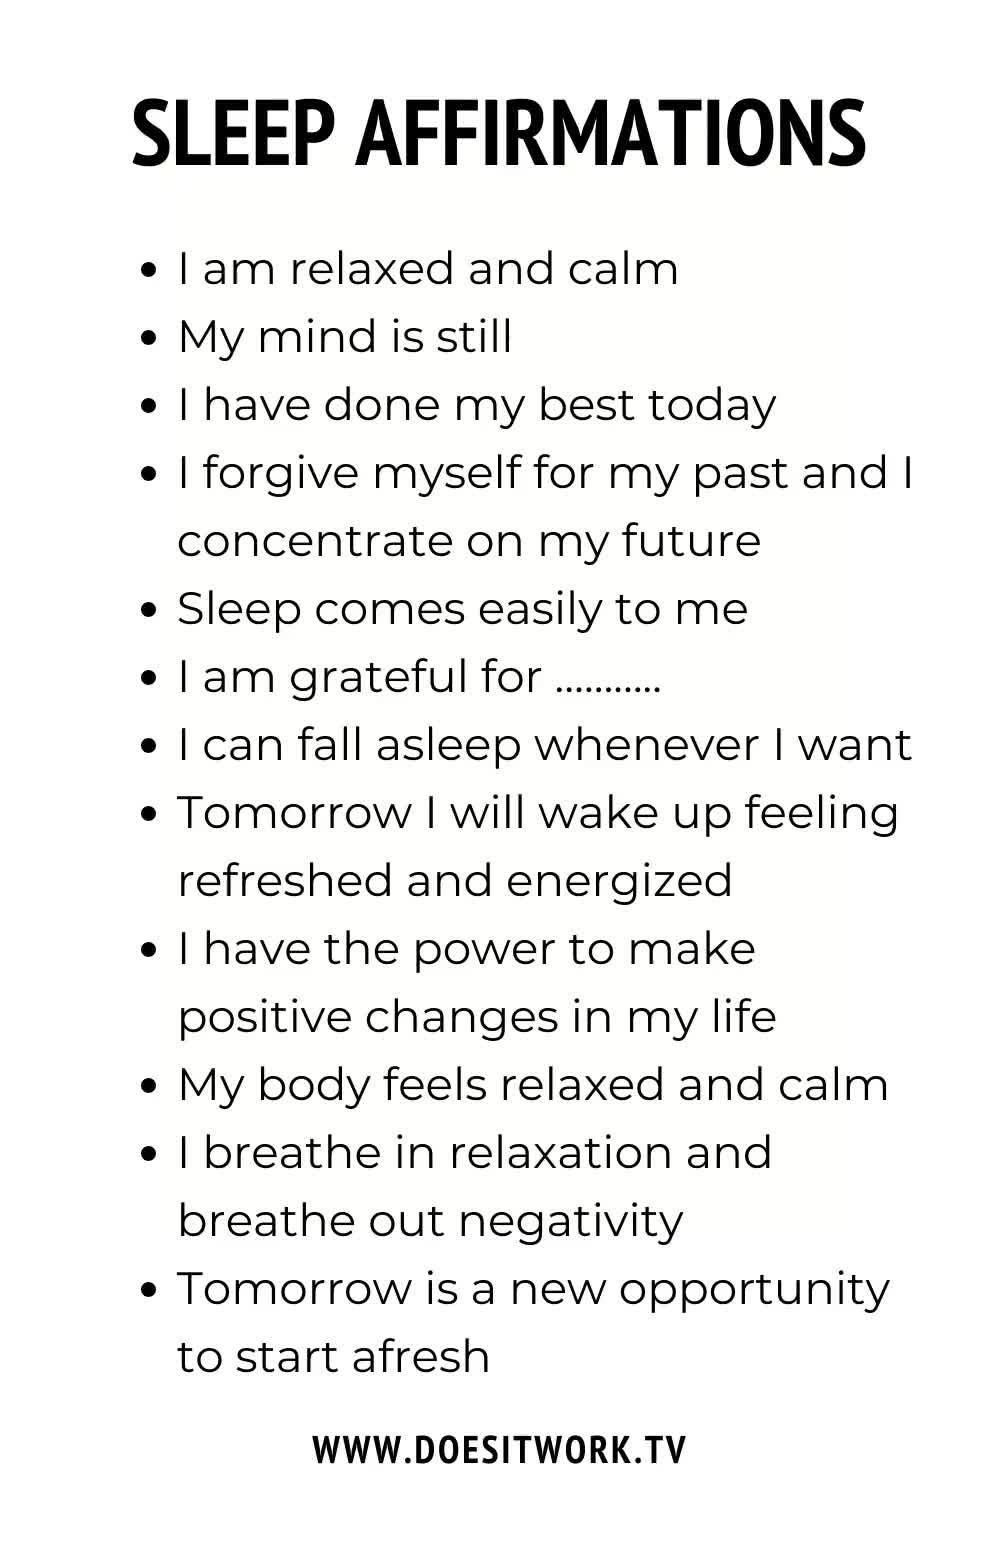 30 Sleep Affirmations for a Zen Night's Sleep